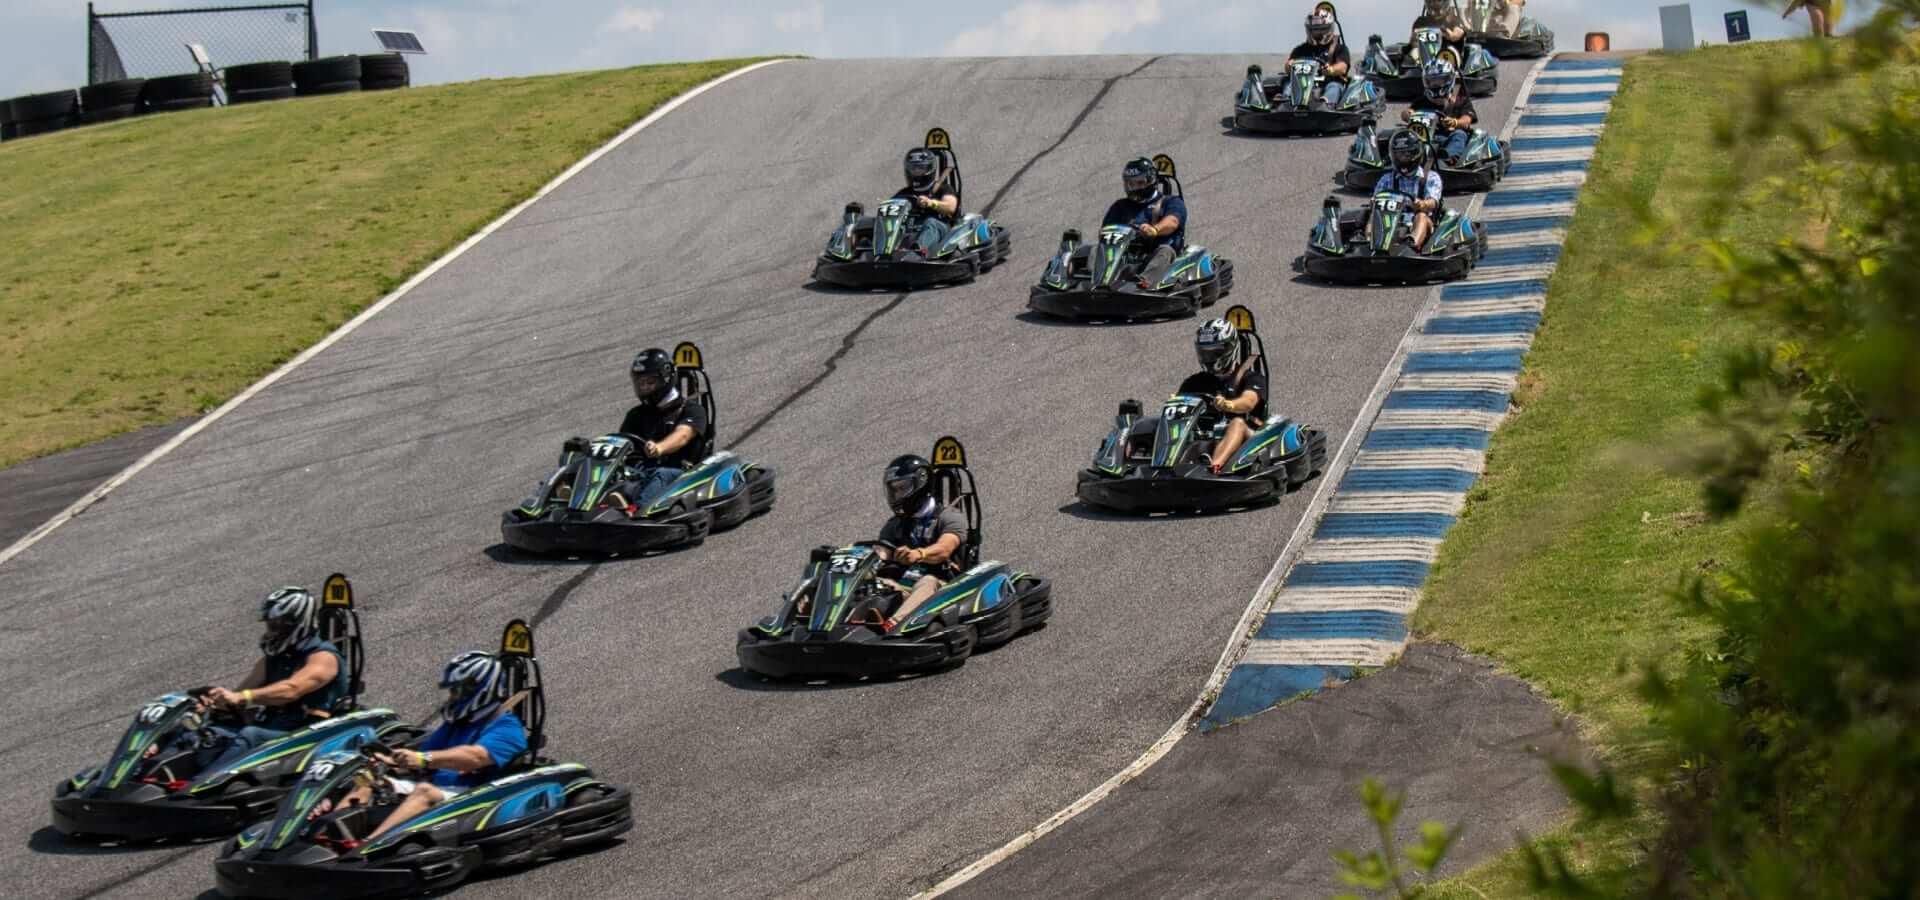 Go Karts Atlanta Ga >> Kart Racing Events Atlanta Motorsports Park